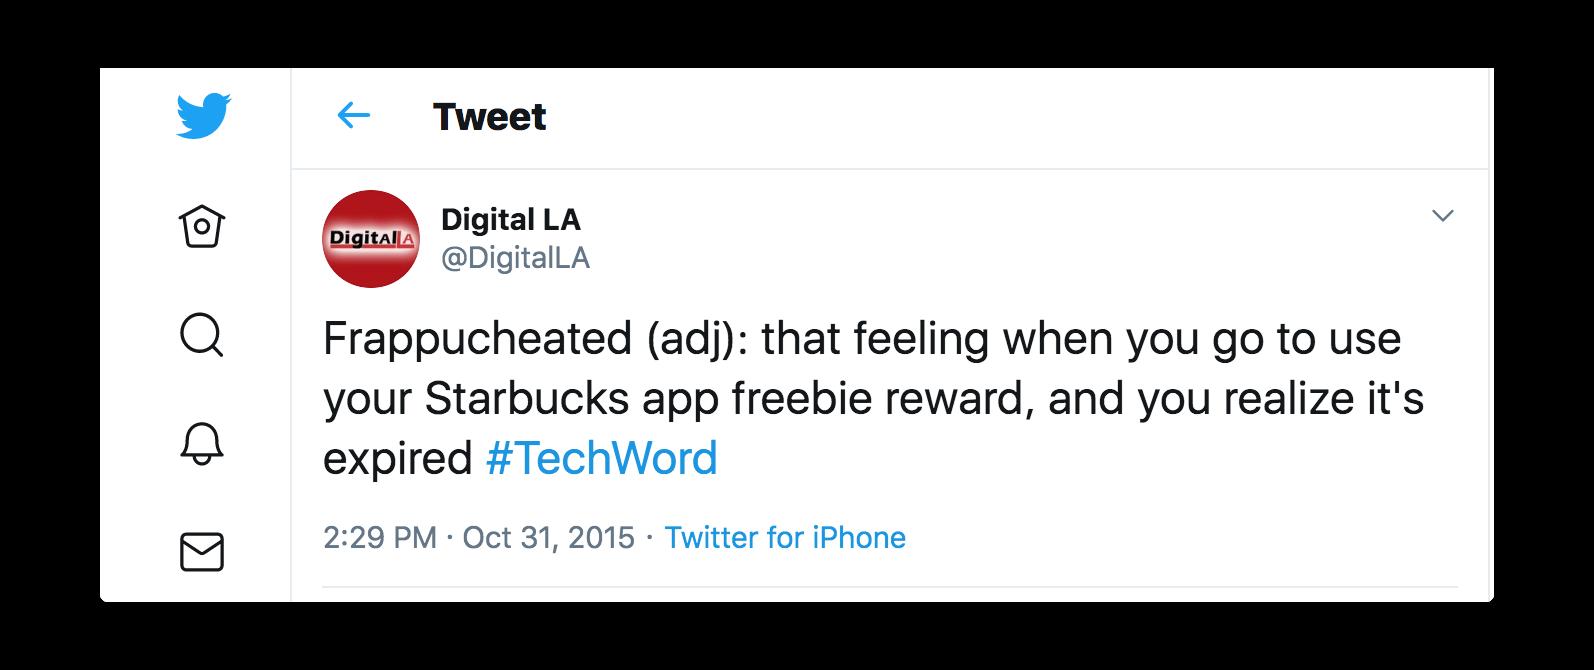 people love starbucks app freebies